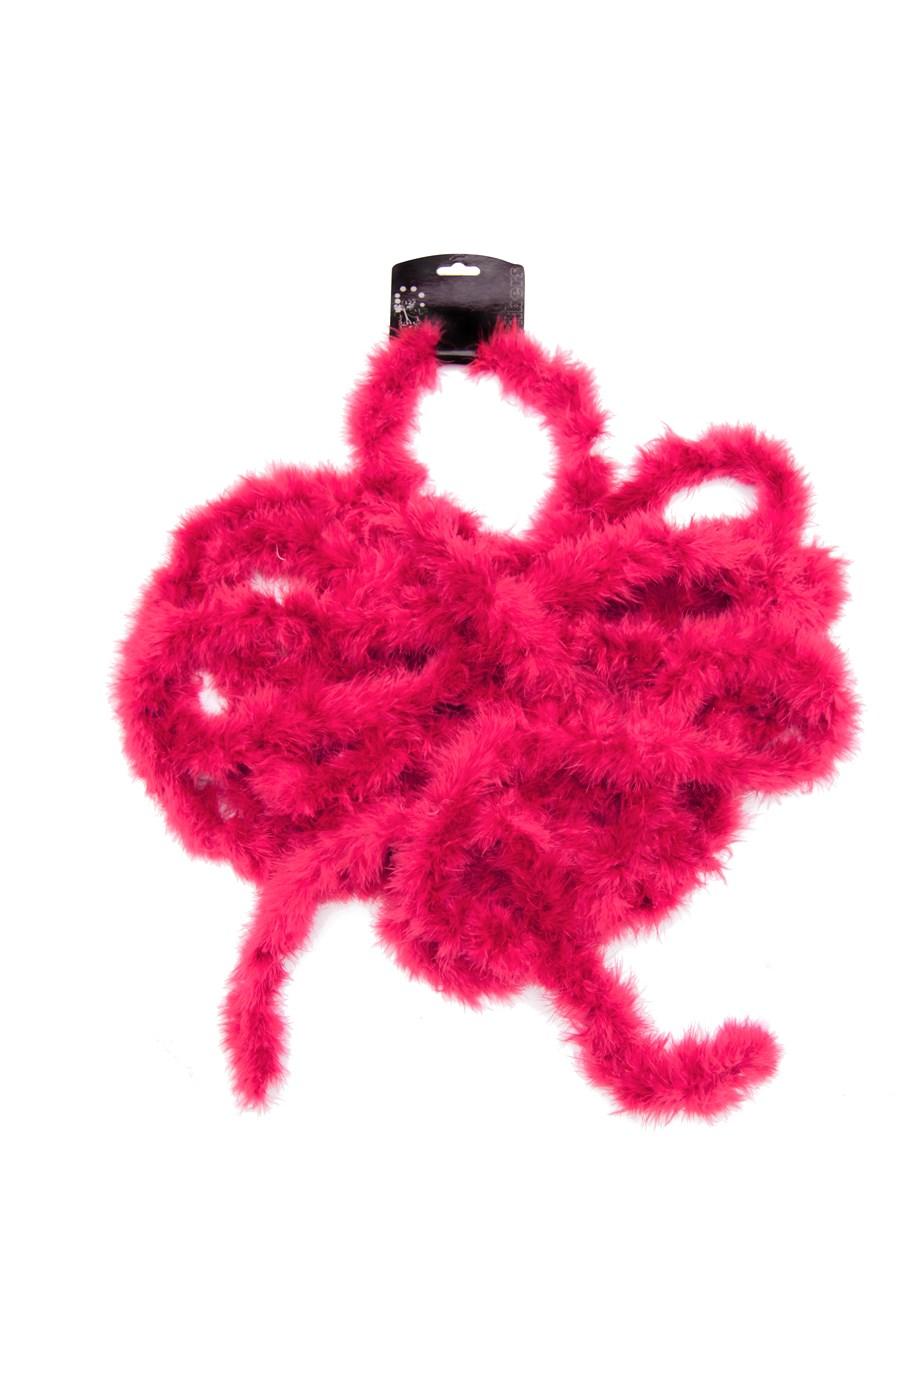 Marabou neon pink 10m